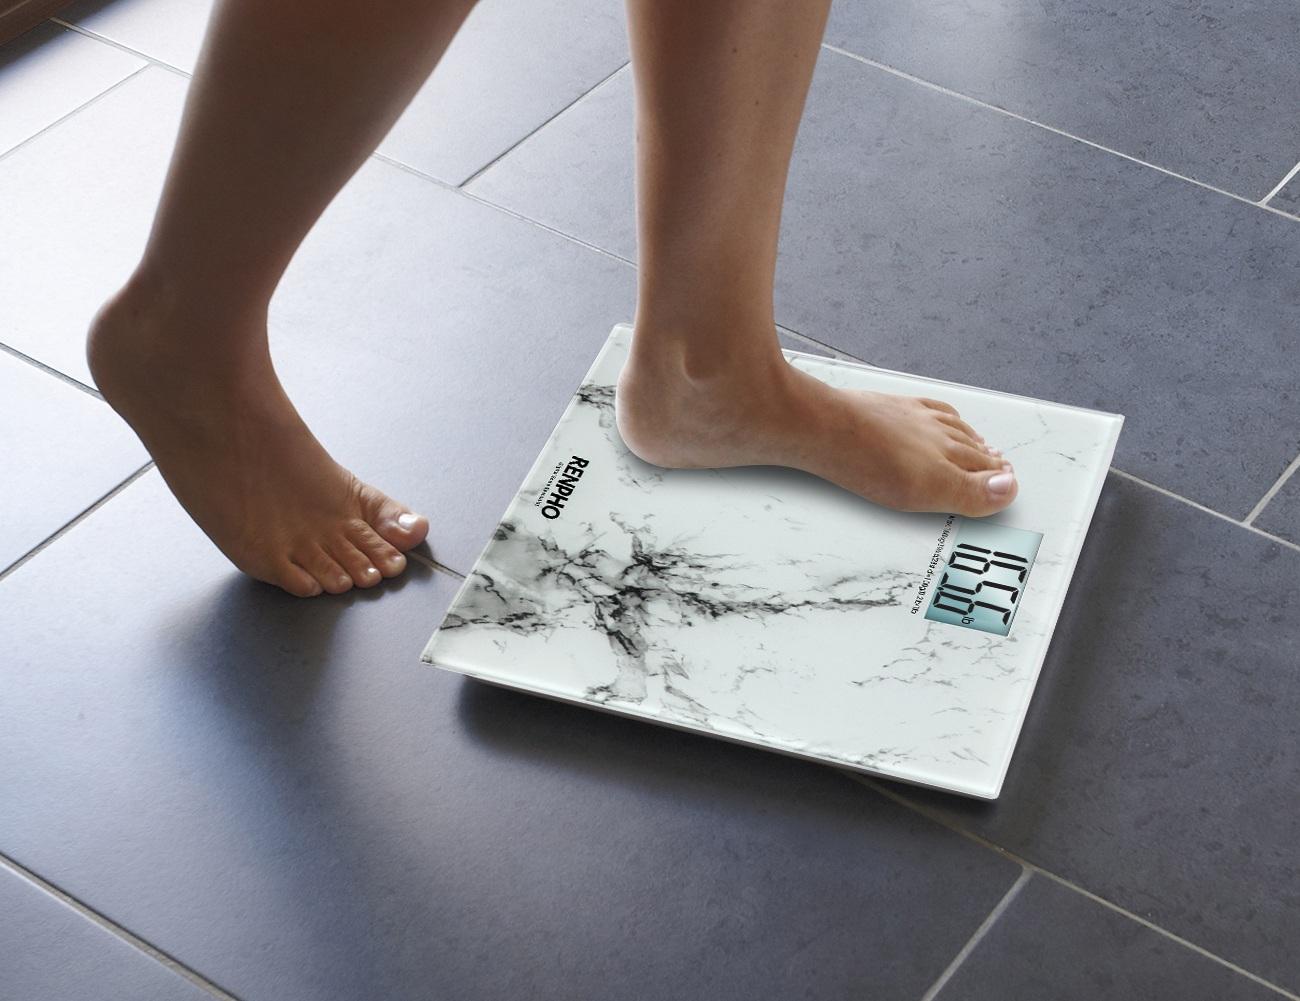 RENPHO Marble Pattern Digital Bathroom Scale